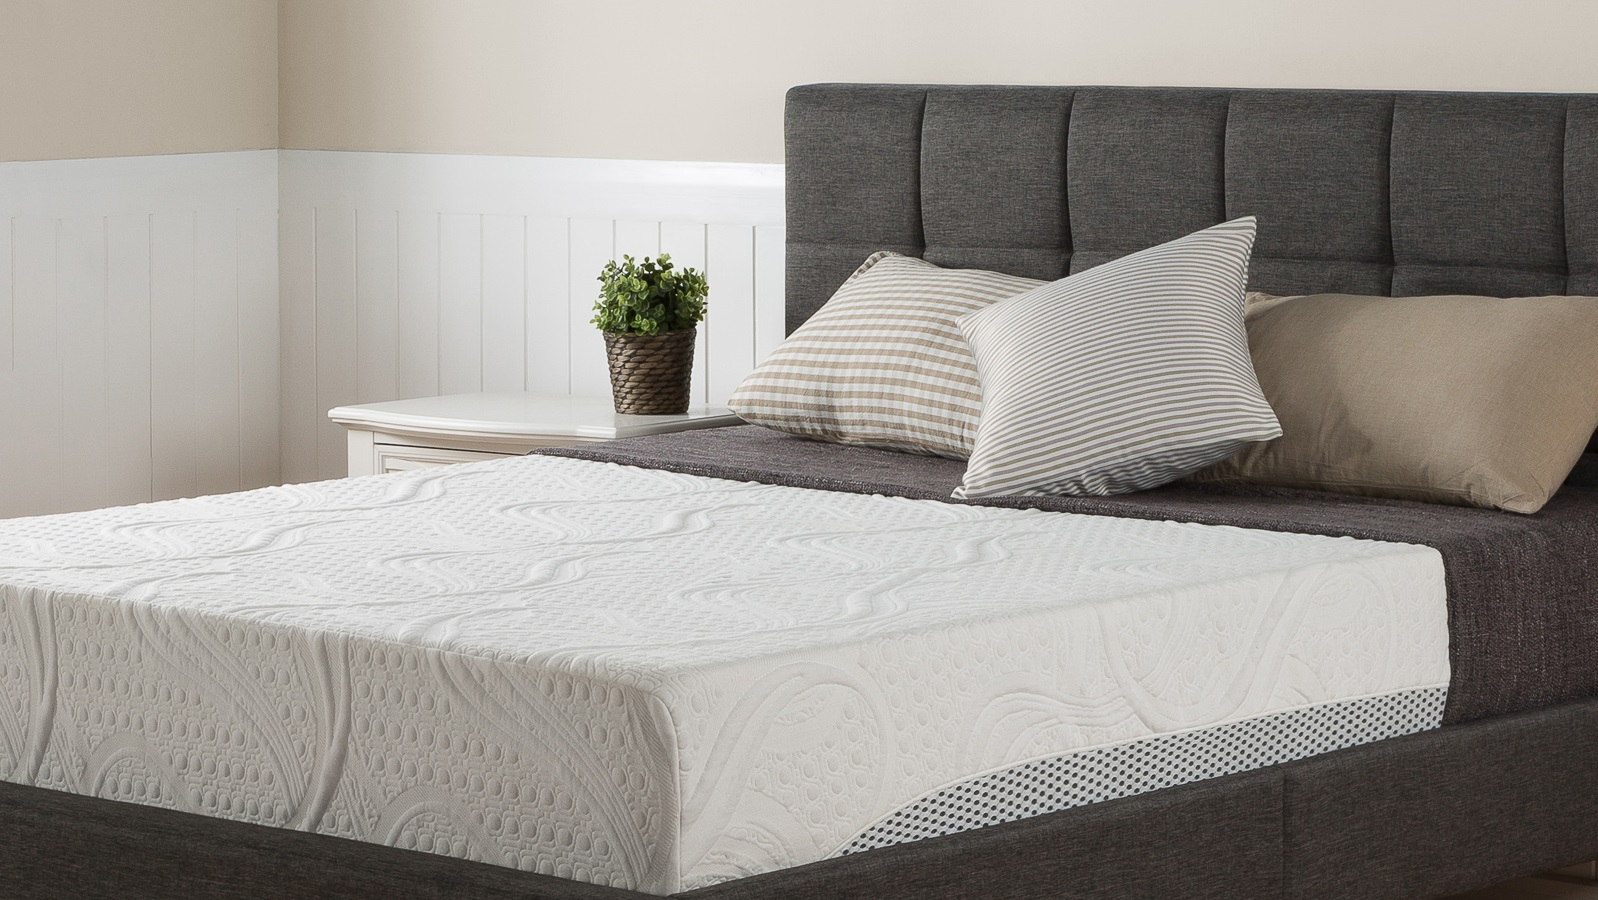 Night Therapy 10 Memory Foam Mattress Twin - Home Mattresses & Accessories